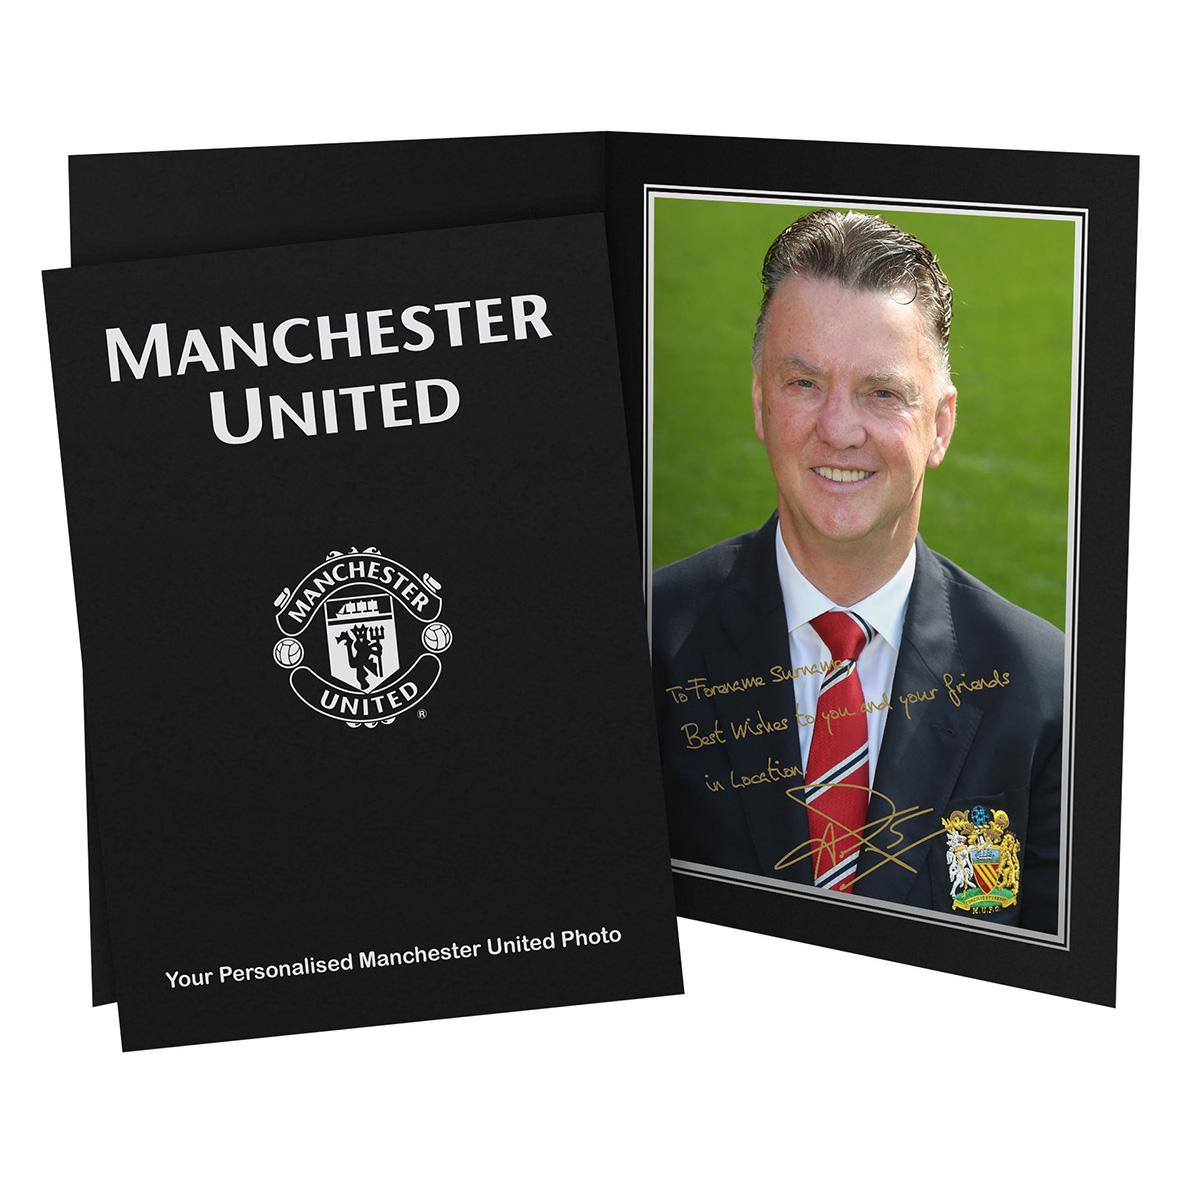 Manchester United Personalised Signature Photo in Presentation Folder - Van Gaal